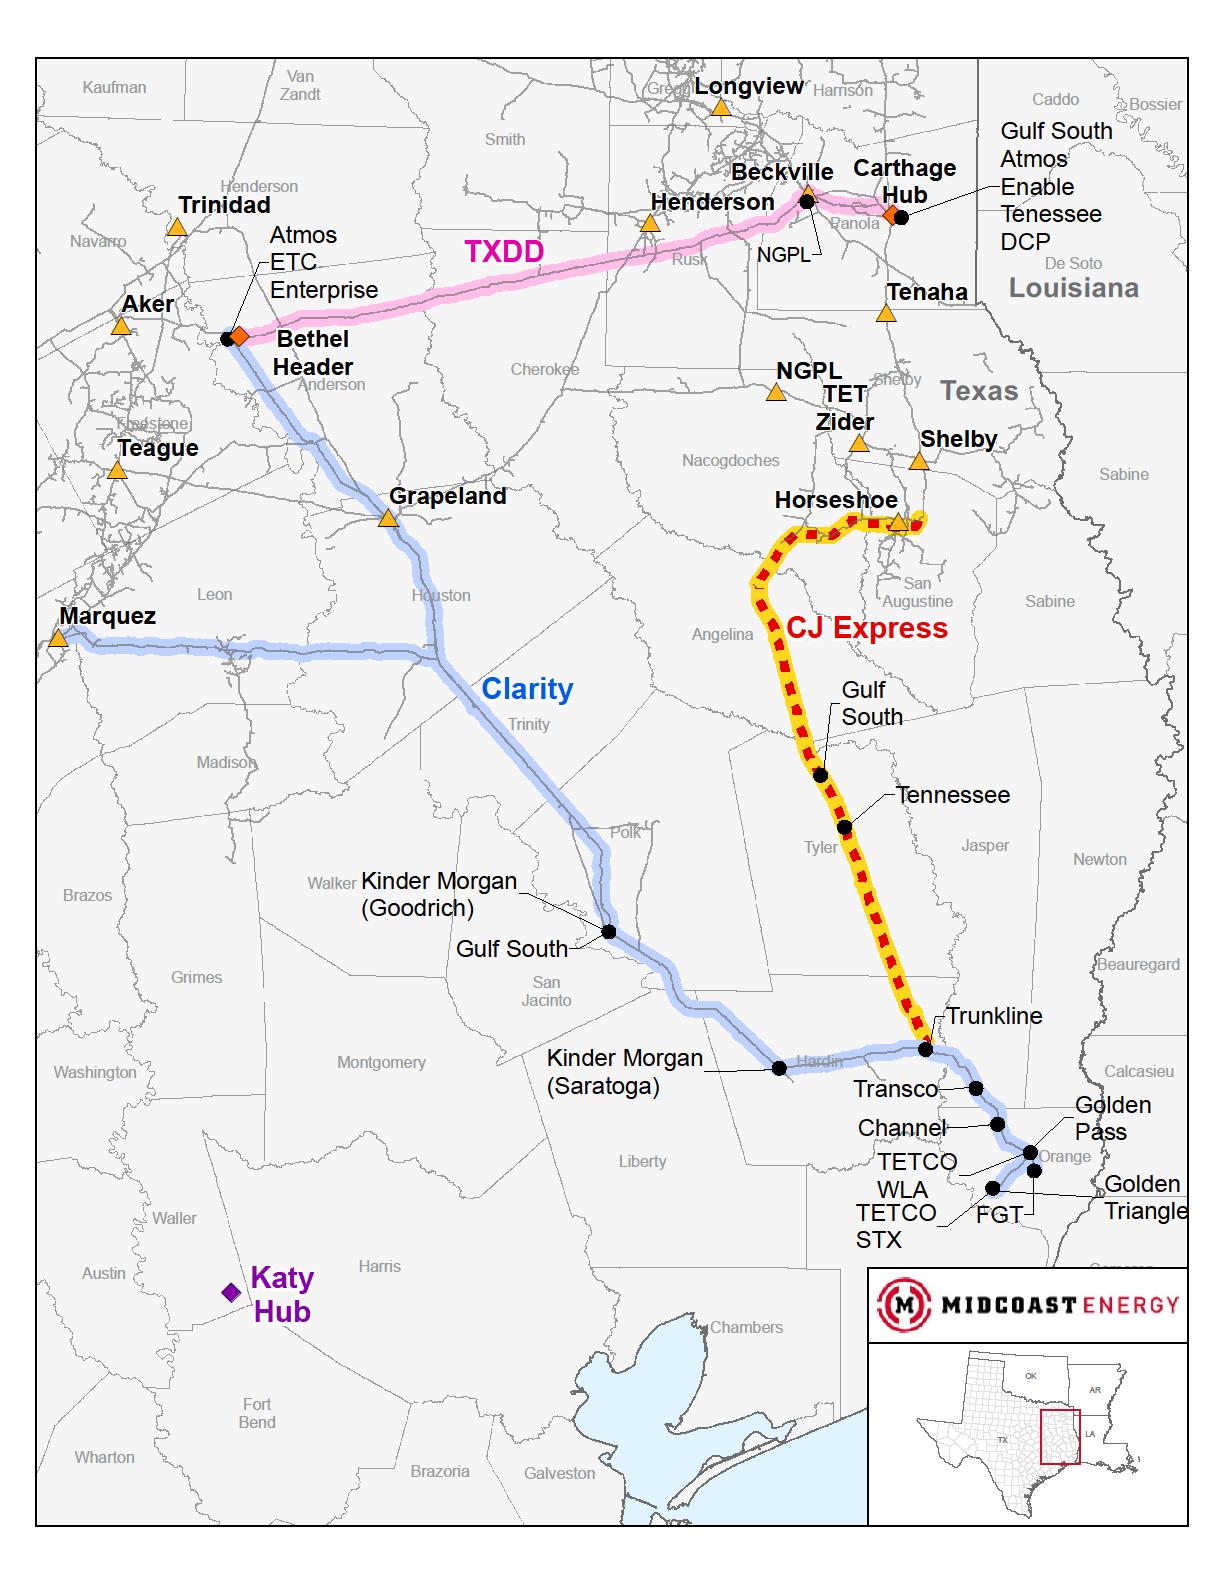 CJ Express Pipeline Project | Midcoast Energy